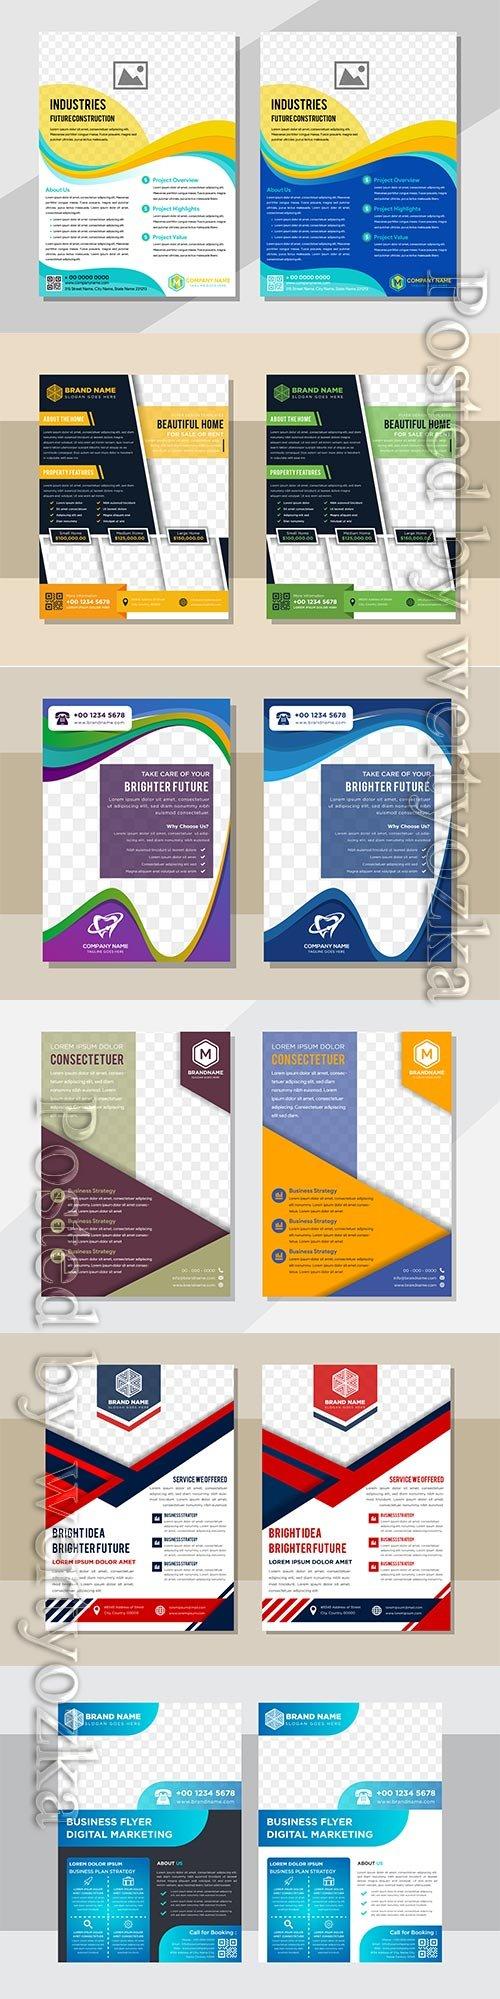 Business flyer template design, brochure vector illustration # 2